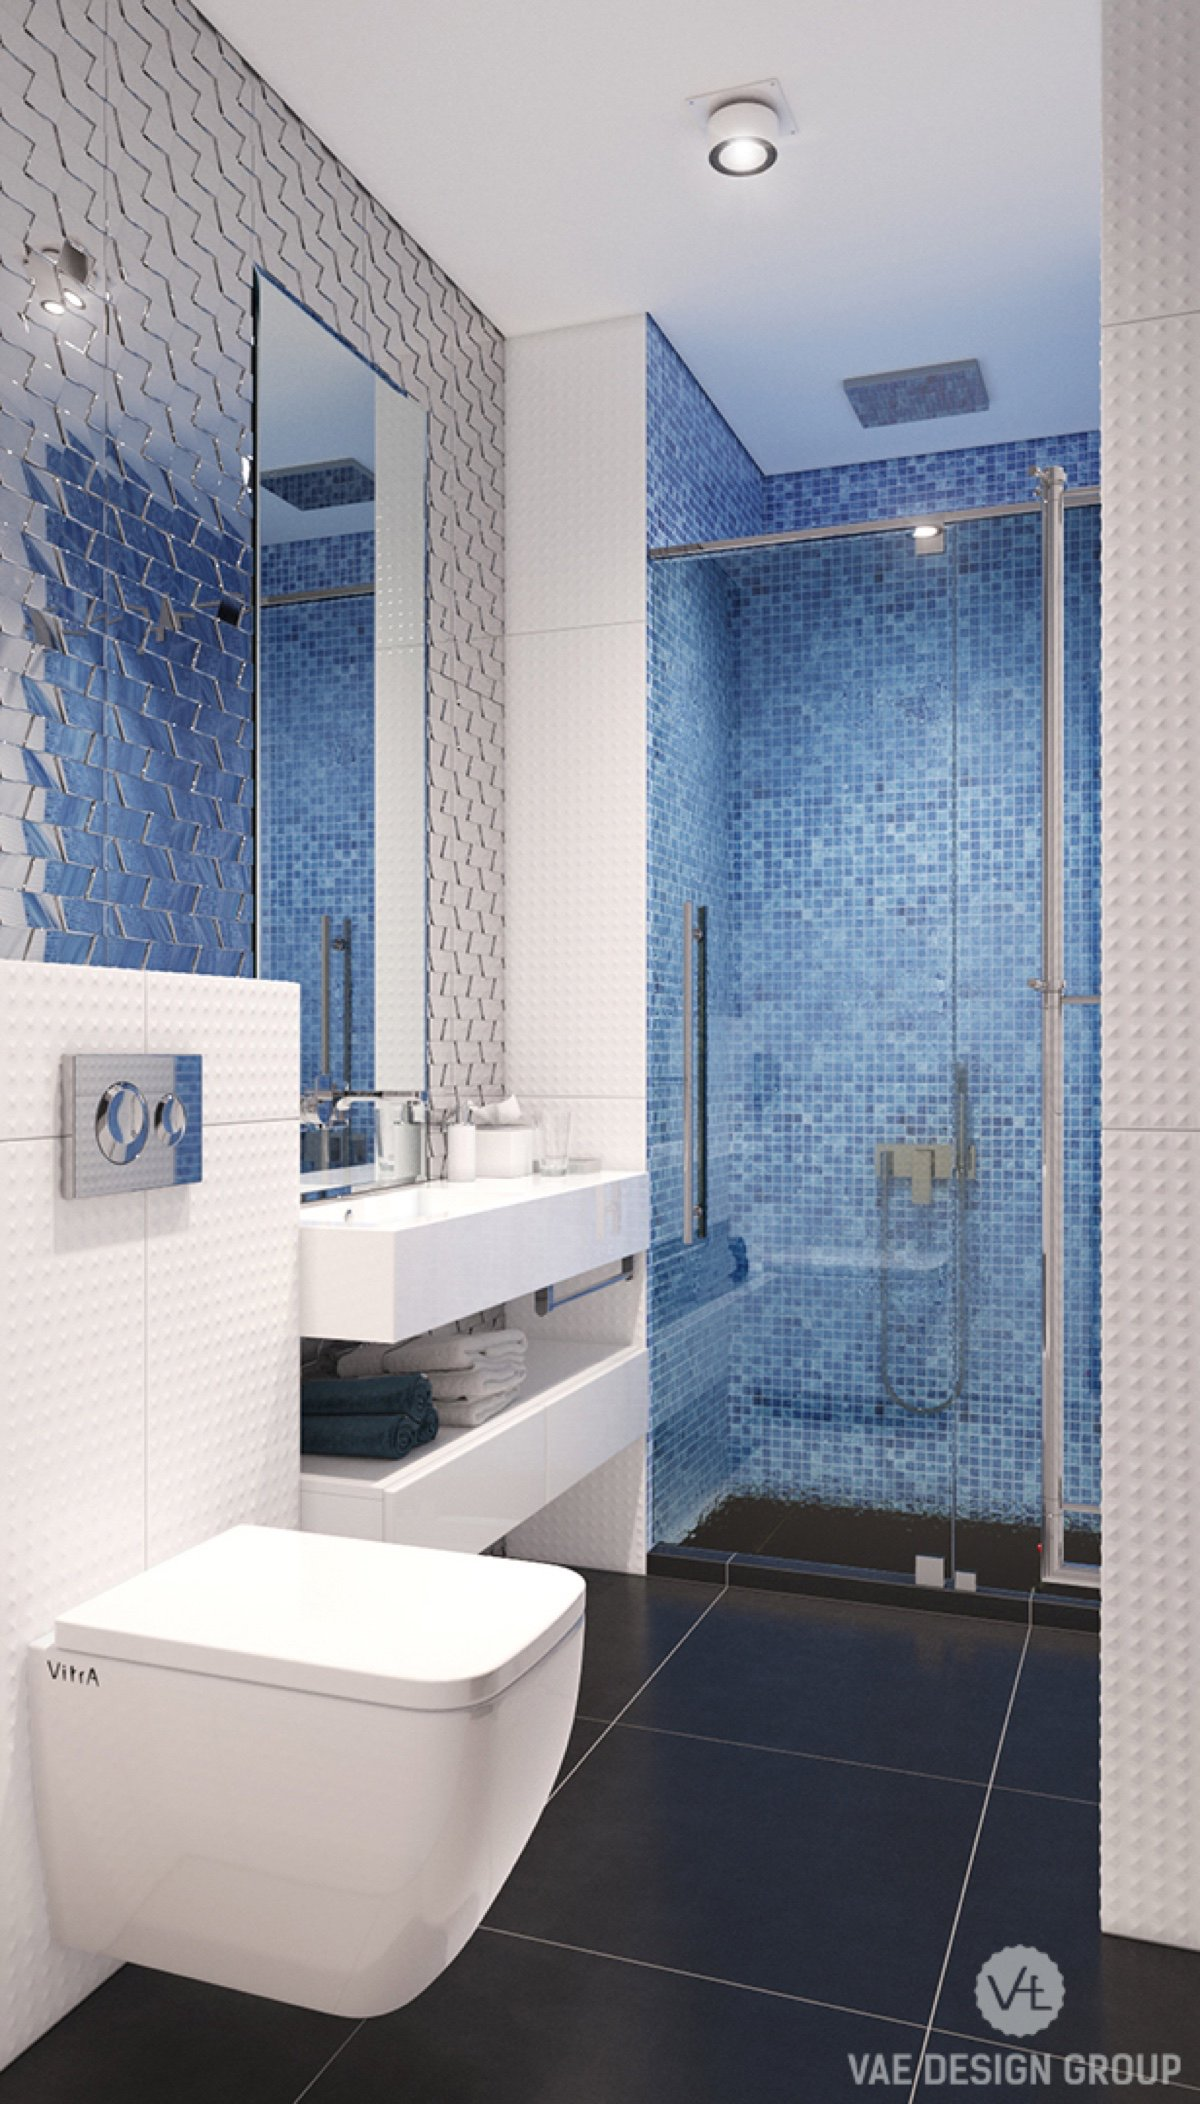 Inspiration To Arrange Minimalist Bathroom Designs With